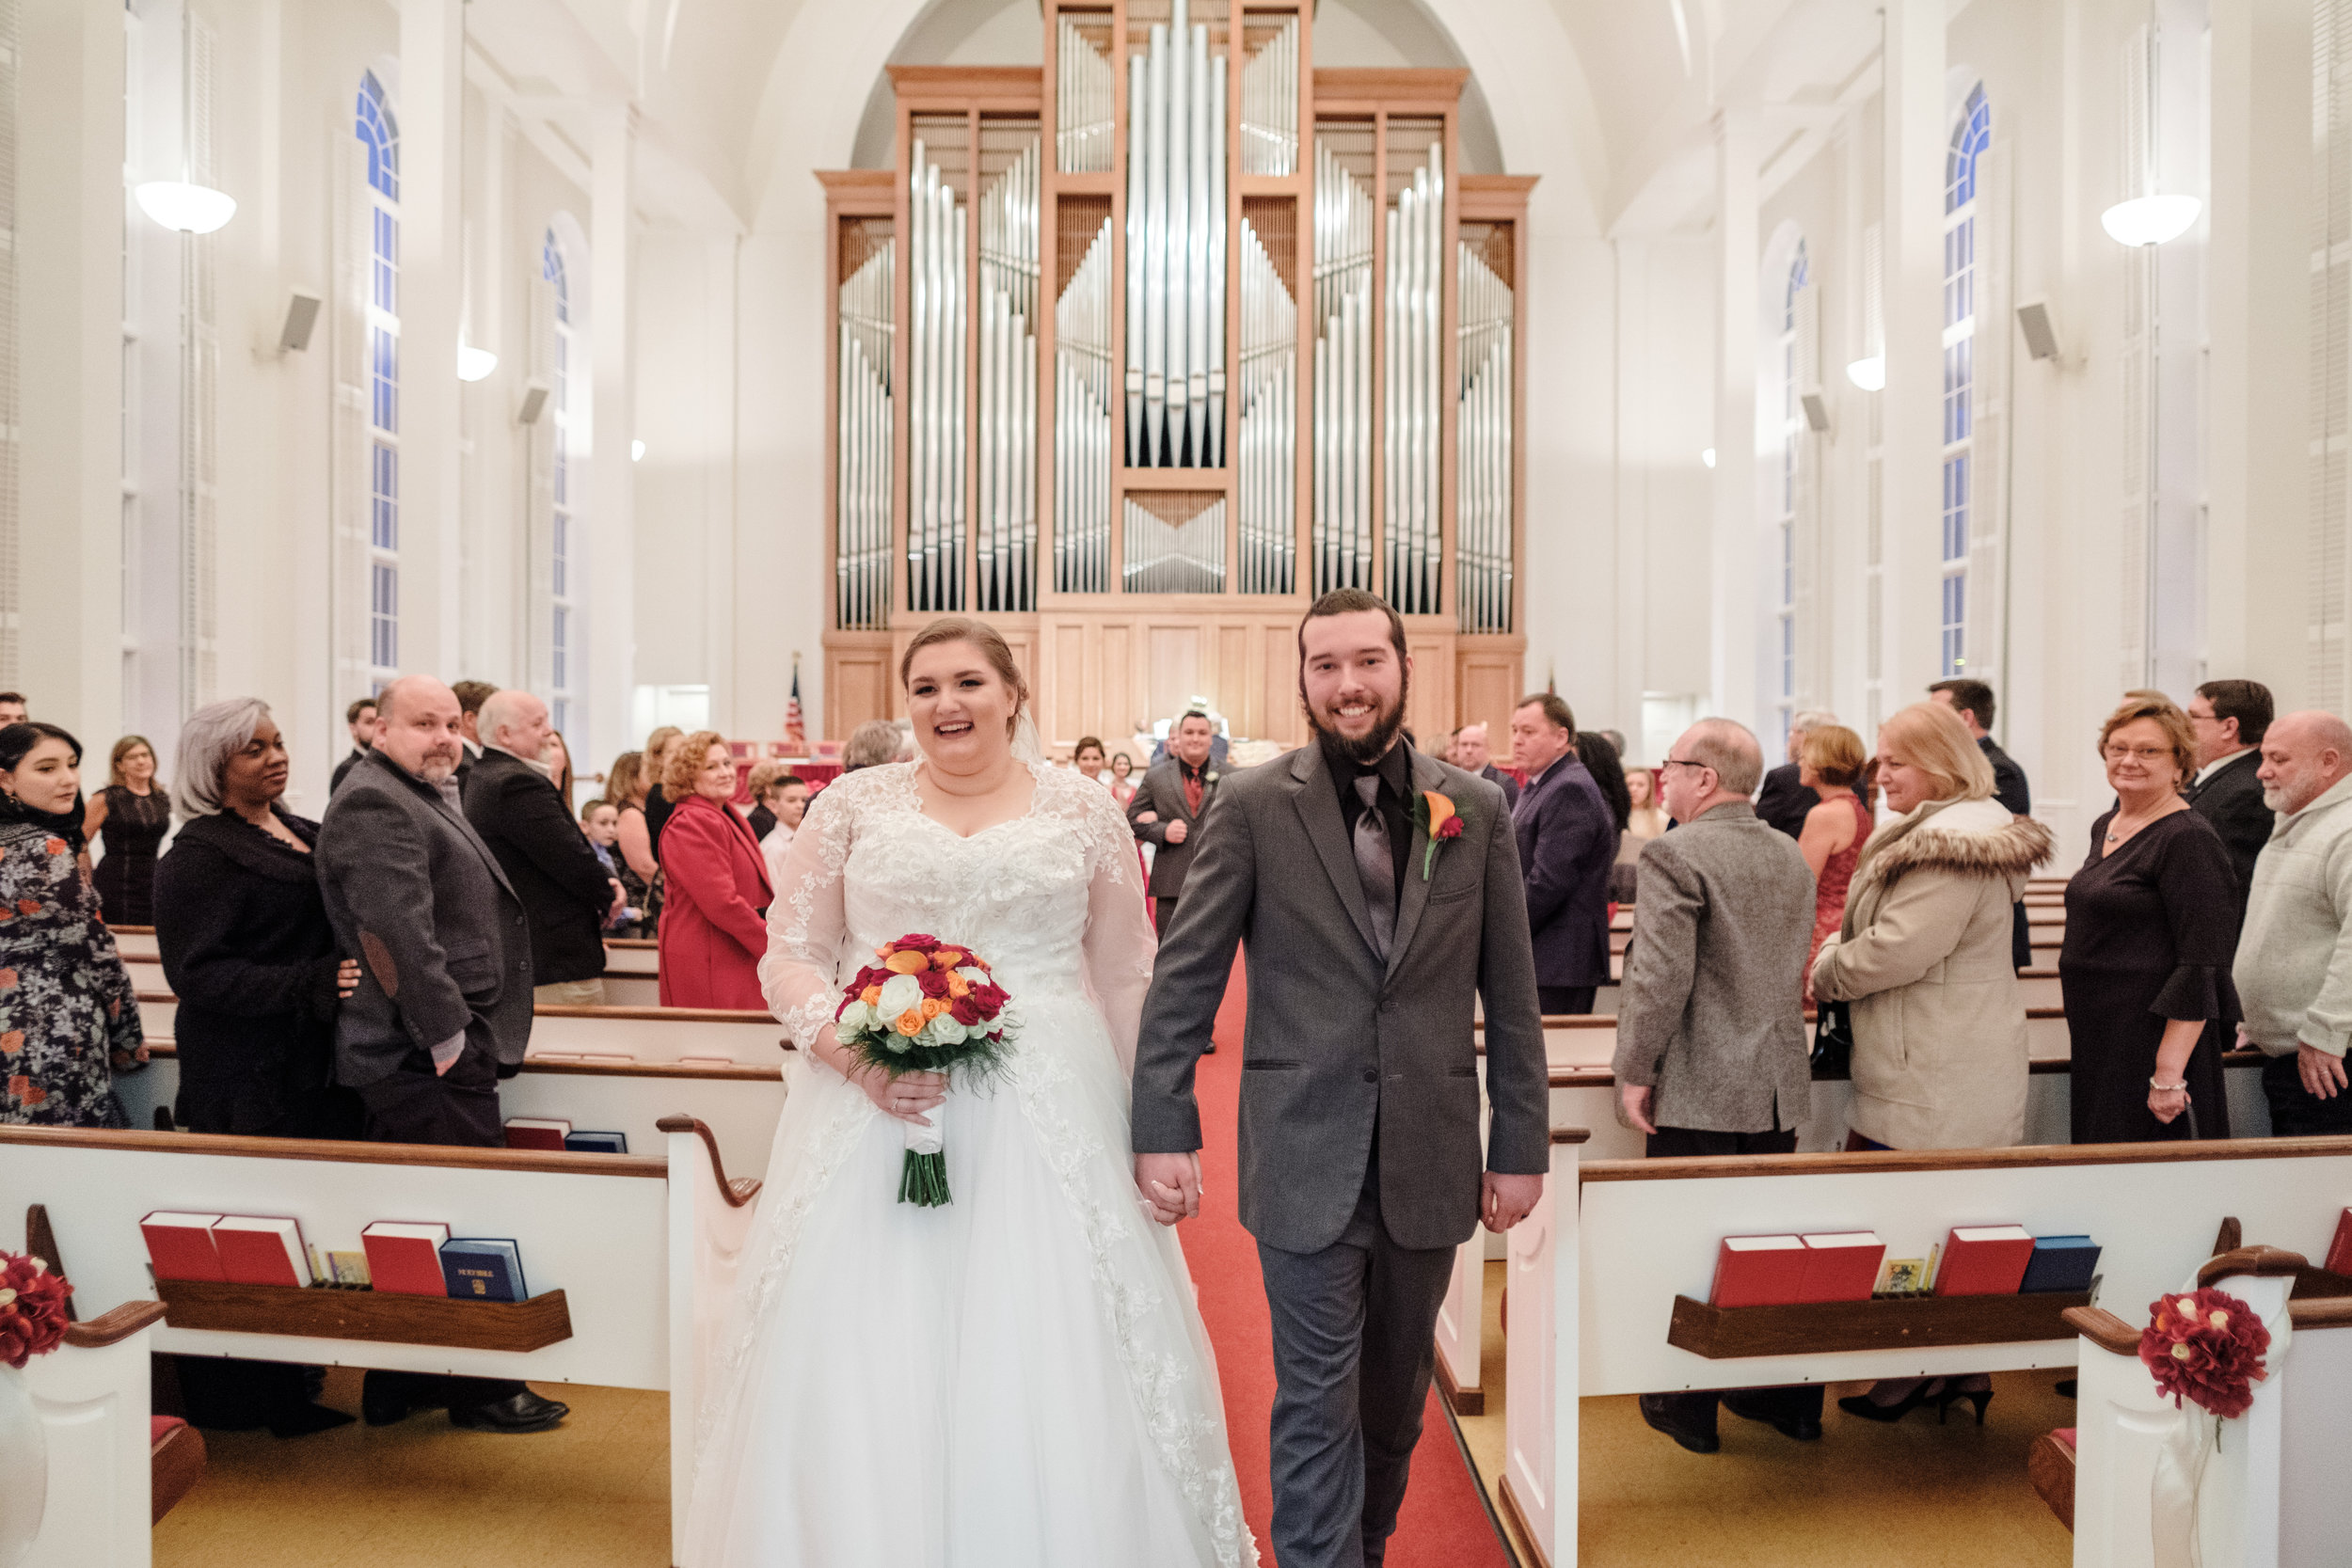 18-12-28 Corinne-Henry-Pavilion-Wedding-314.jpg